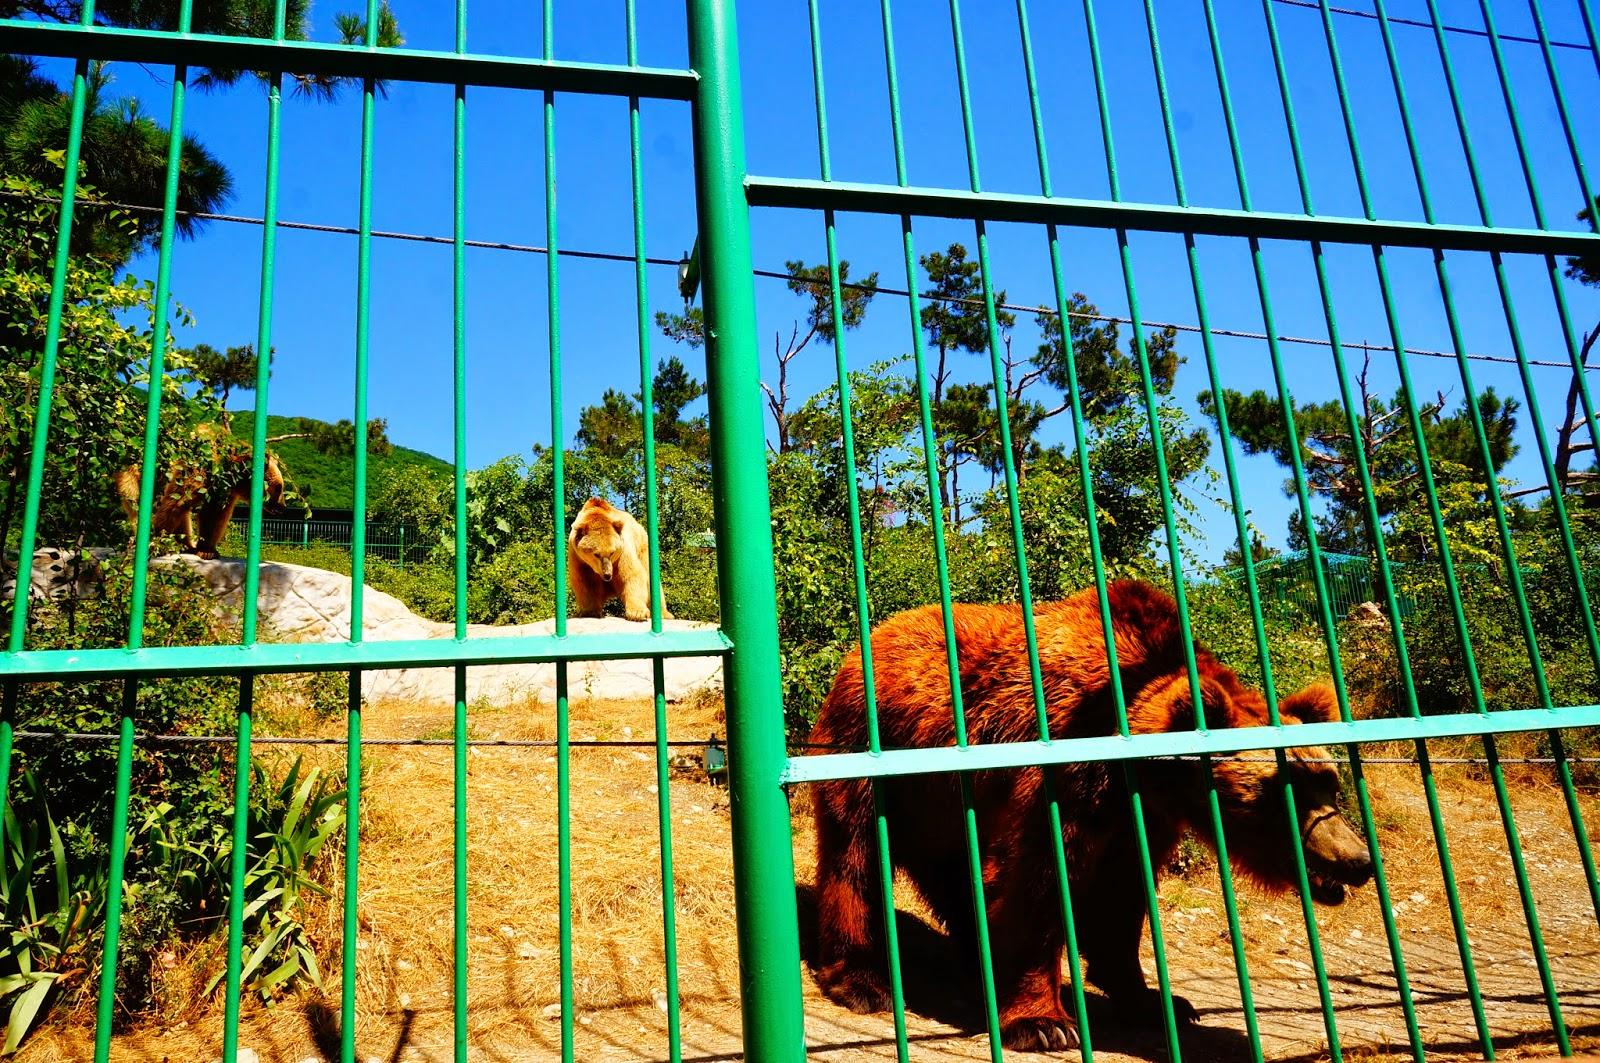 Медведи-Сафари-Парка-в-Геленджике